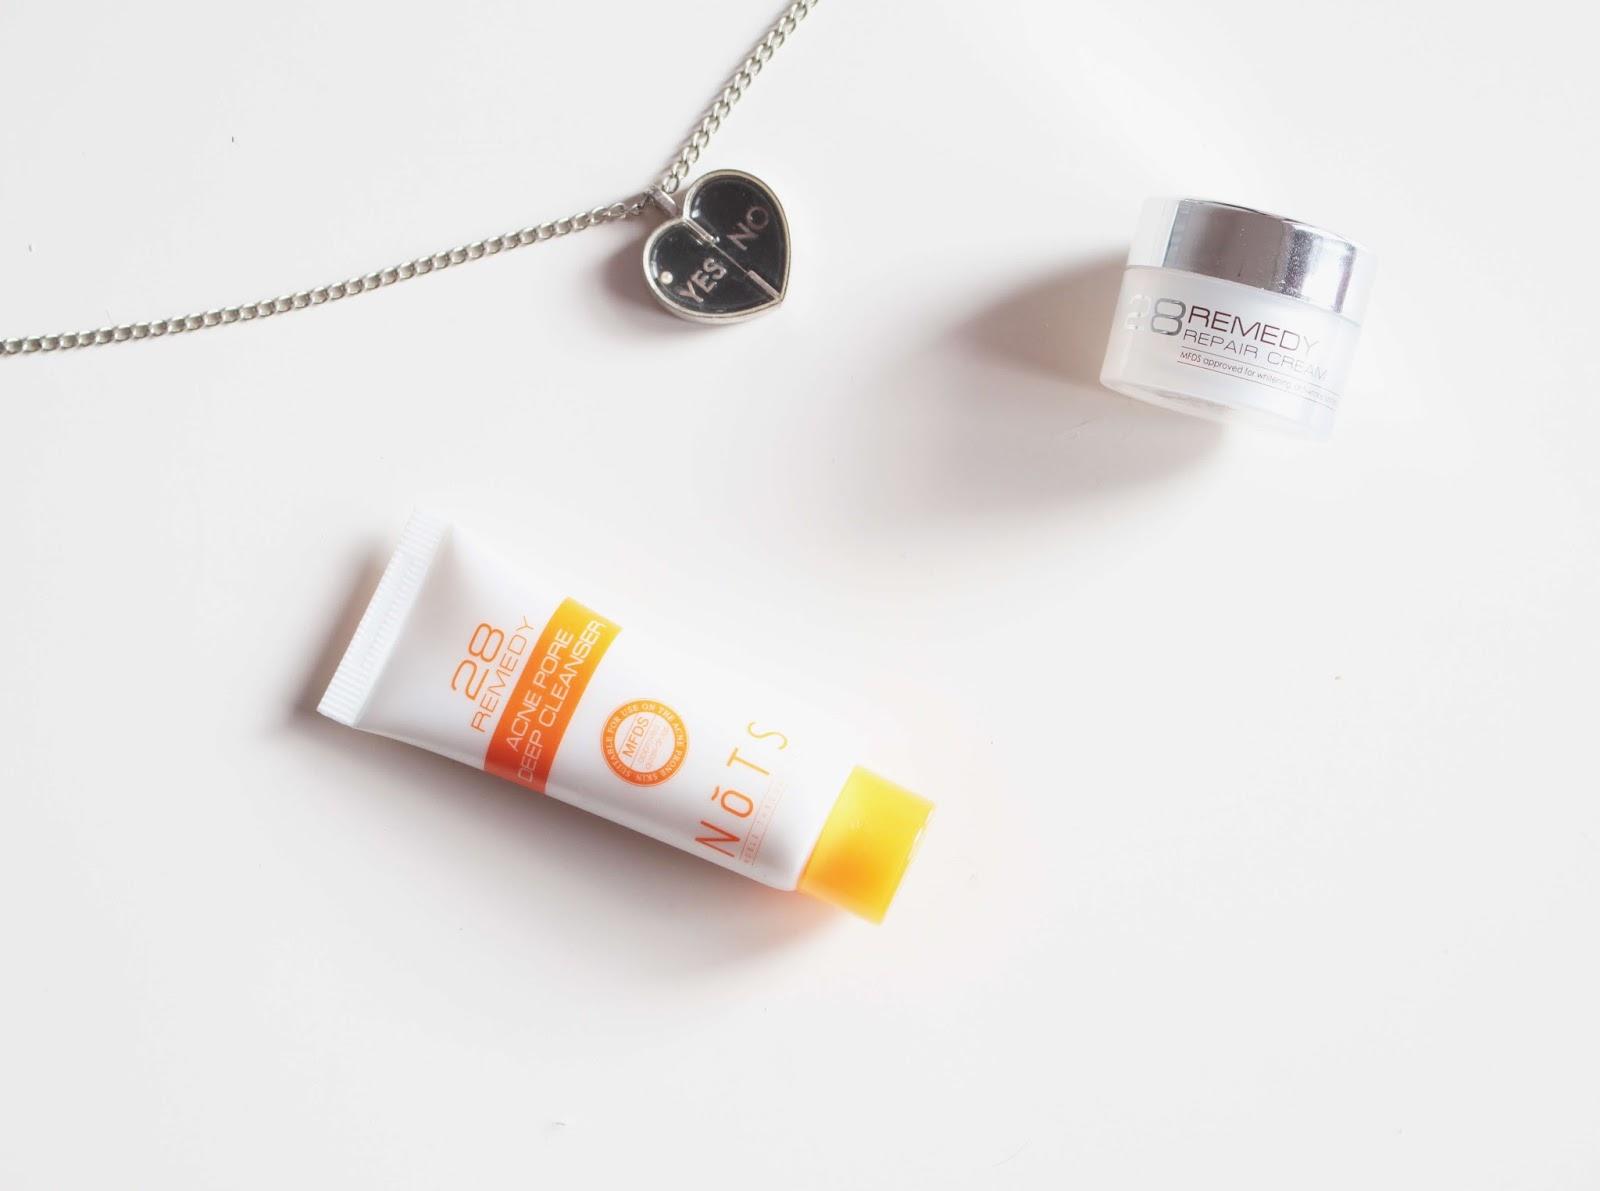 NoTS 28 Remedy Deep Cleanser & Repair Cream review